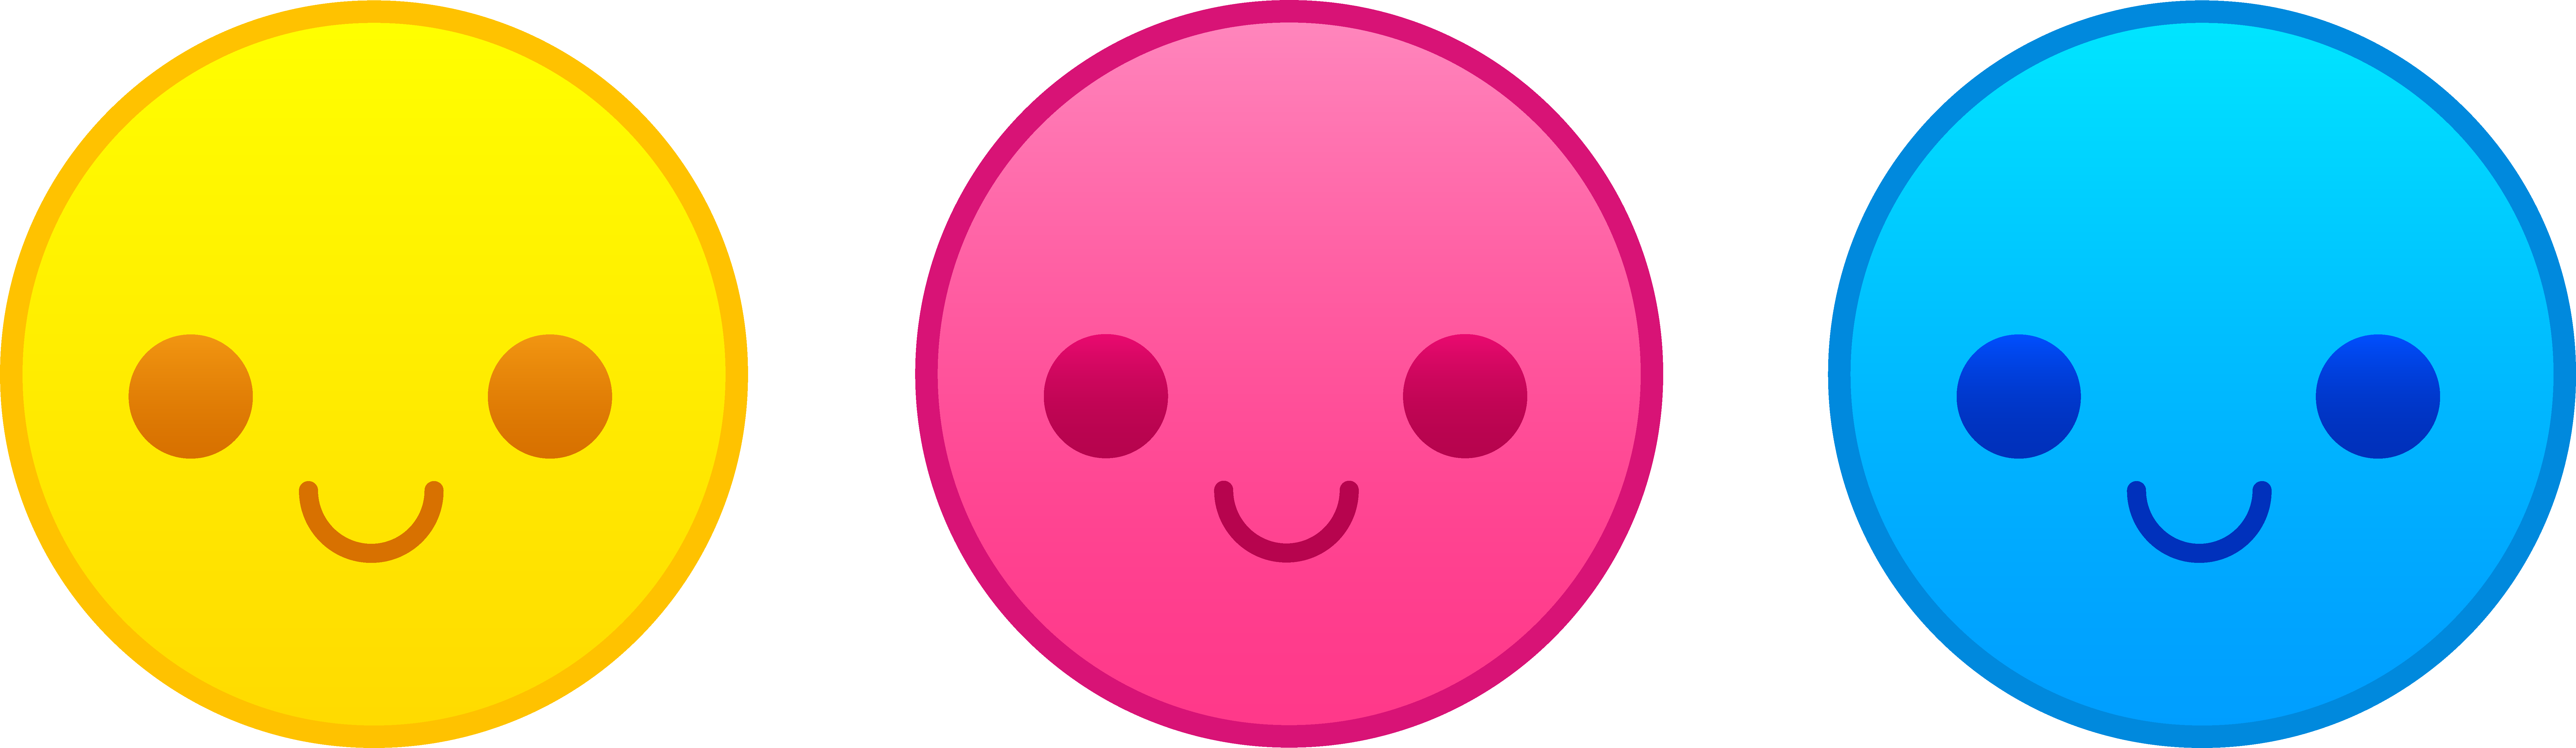 9039x2626 Sad Smiley Face Clip Art Clipart Clipartcow